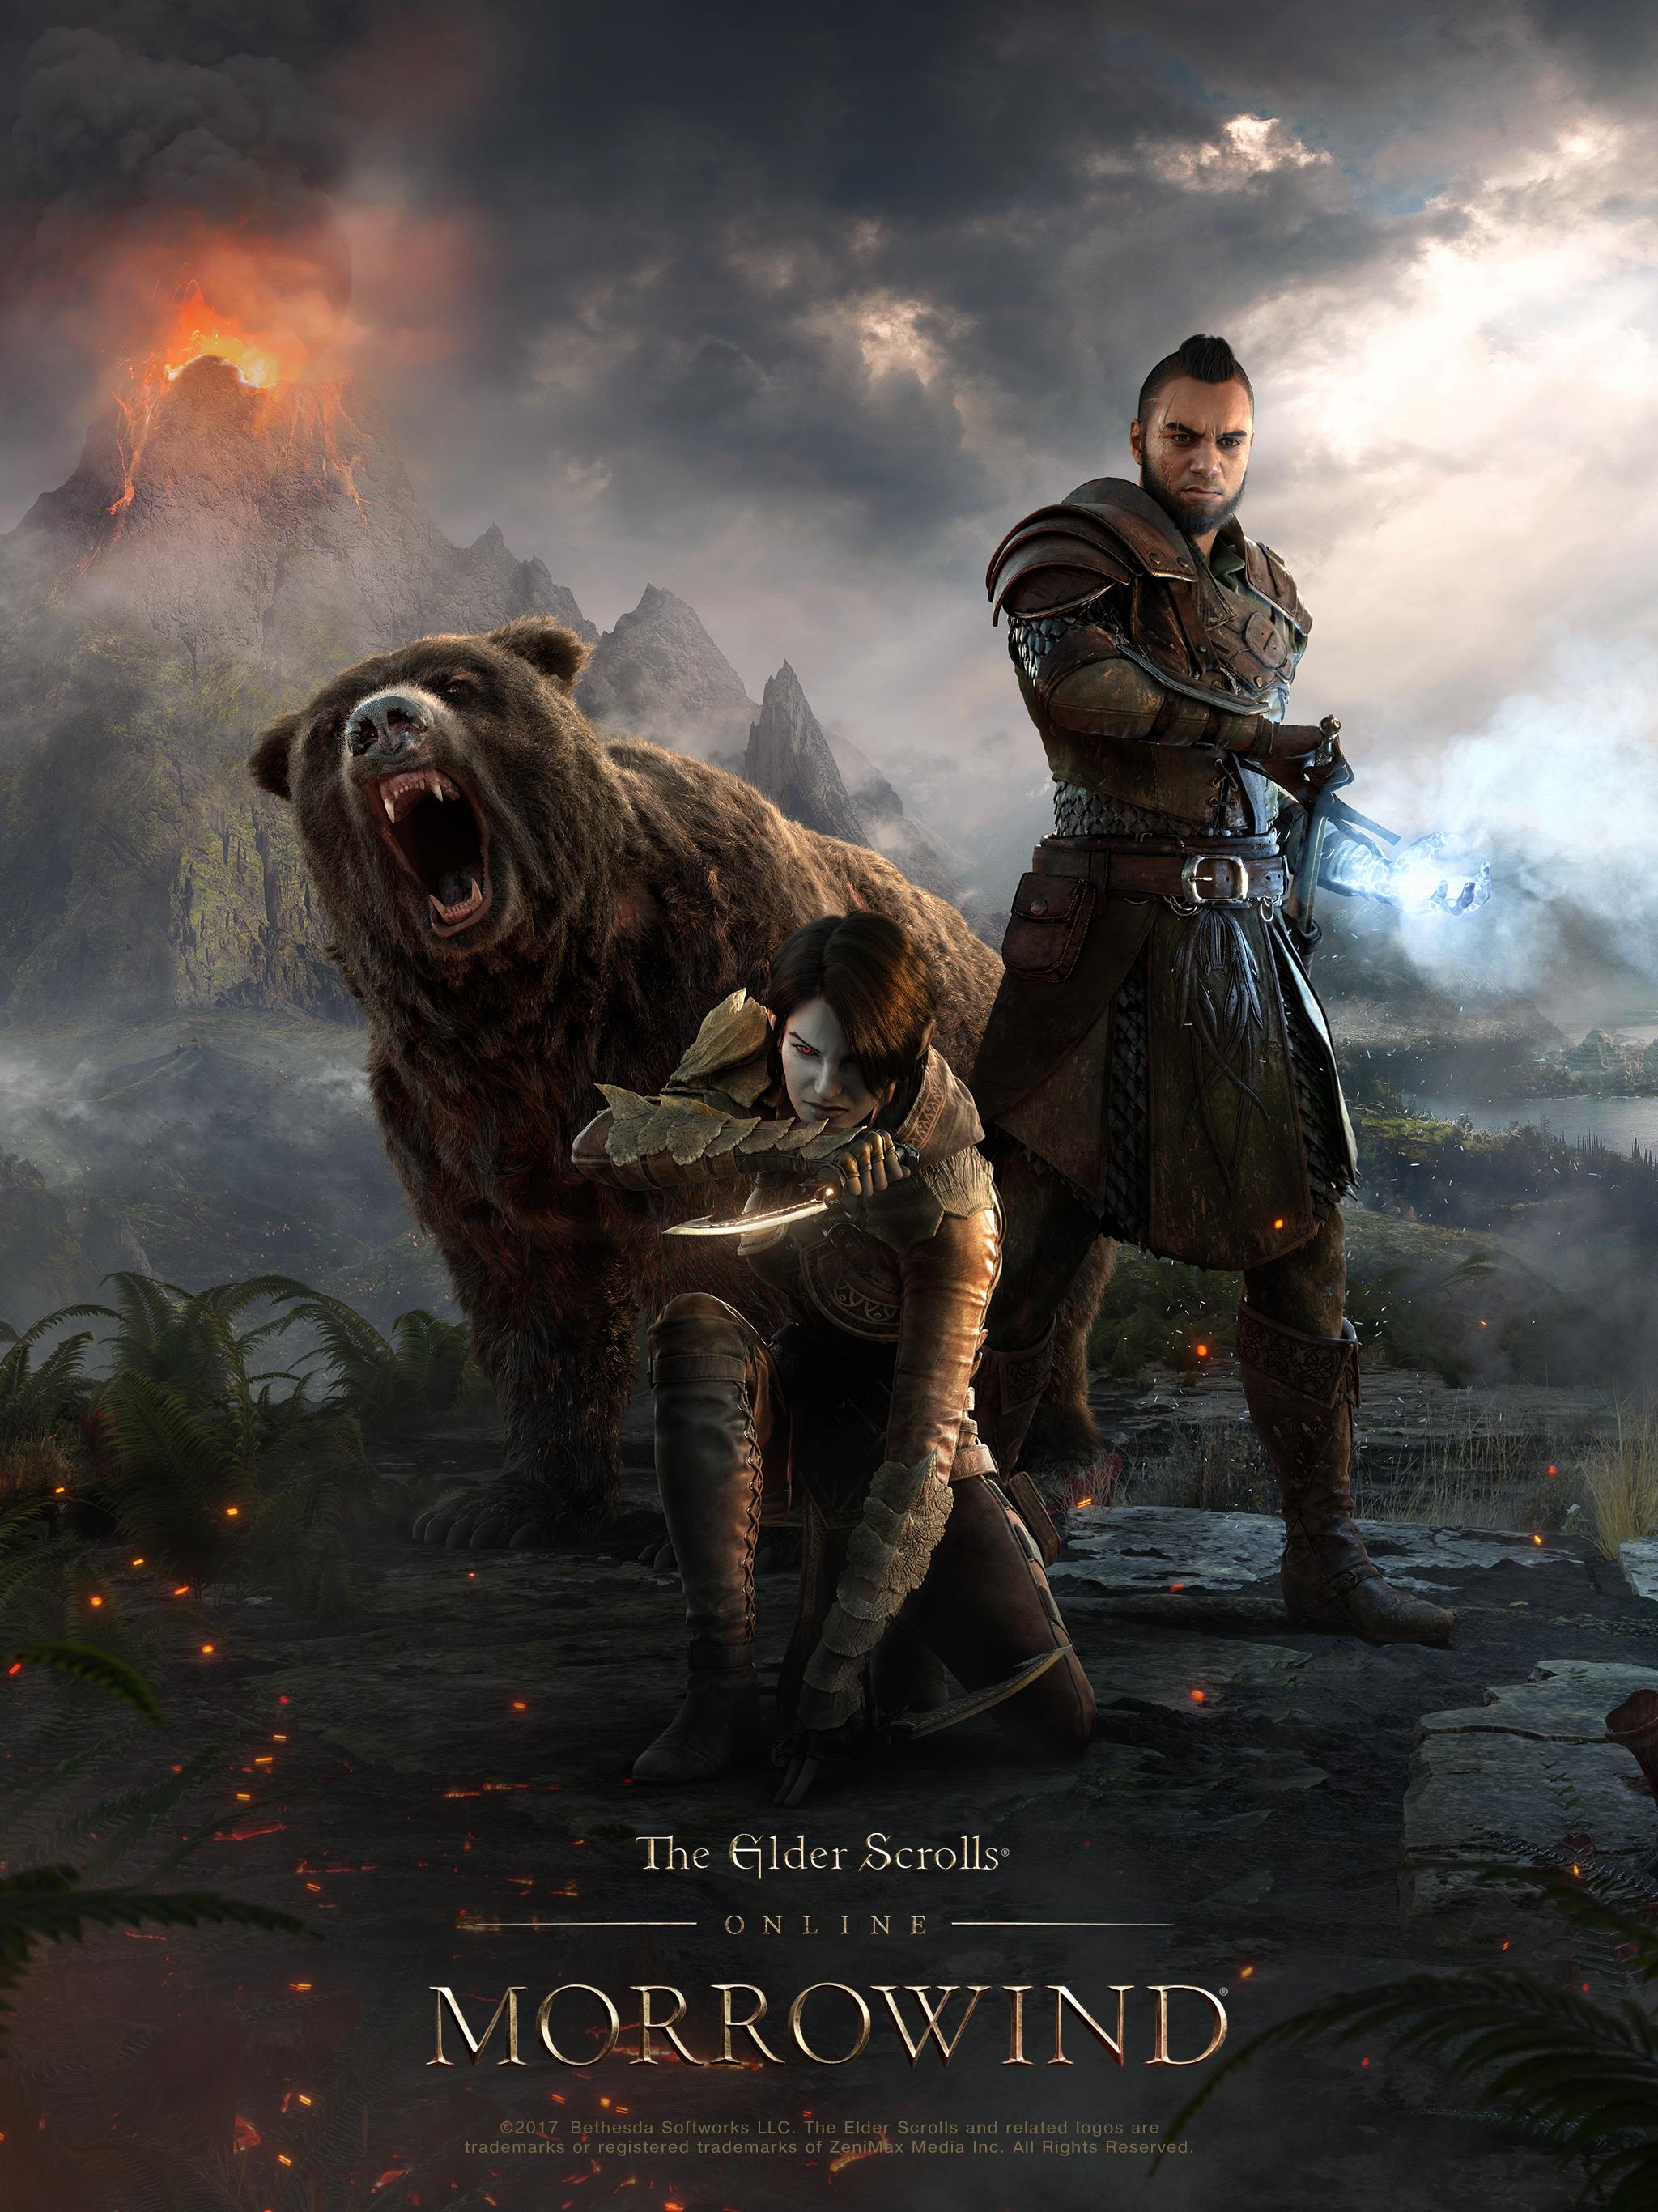 Download The New Eso Morrowind Hero Art Wallpaper The Elder